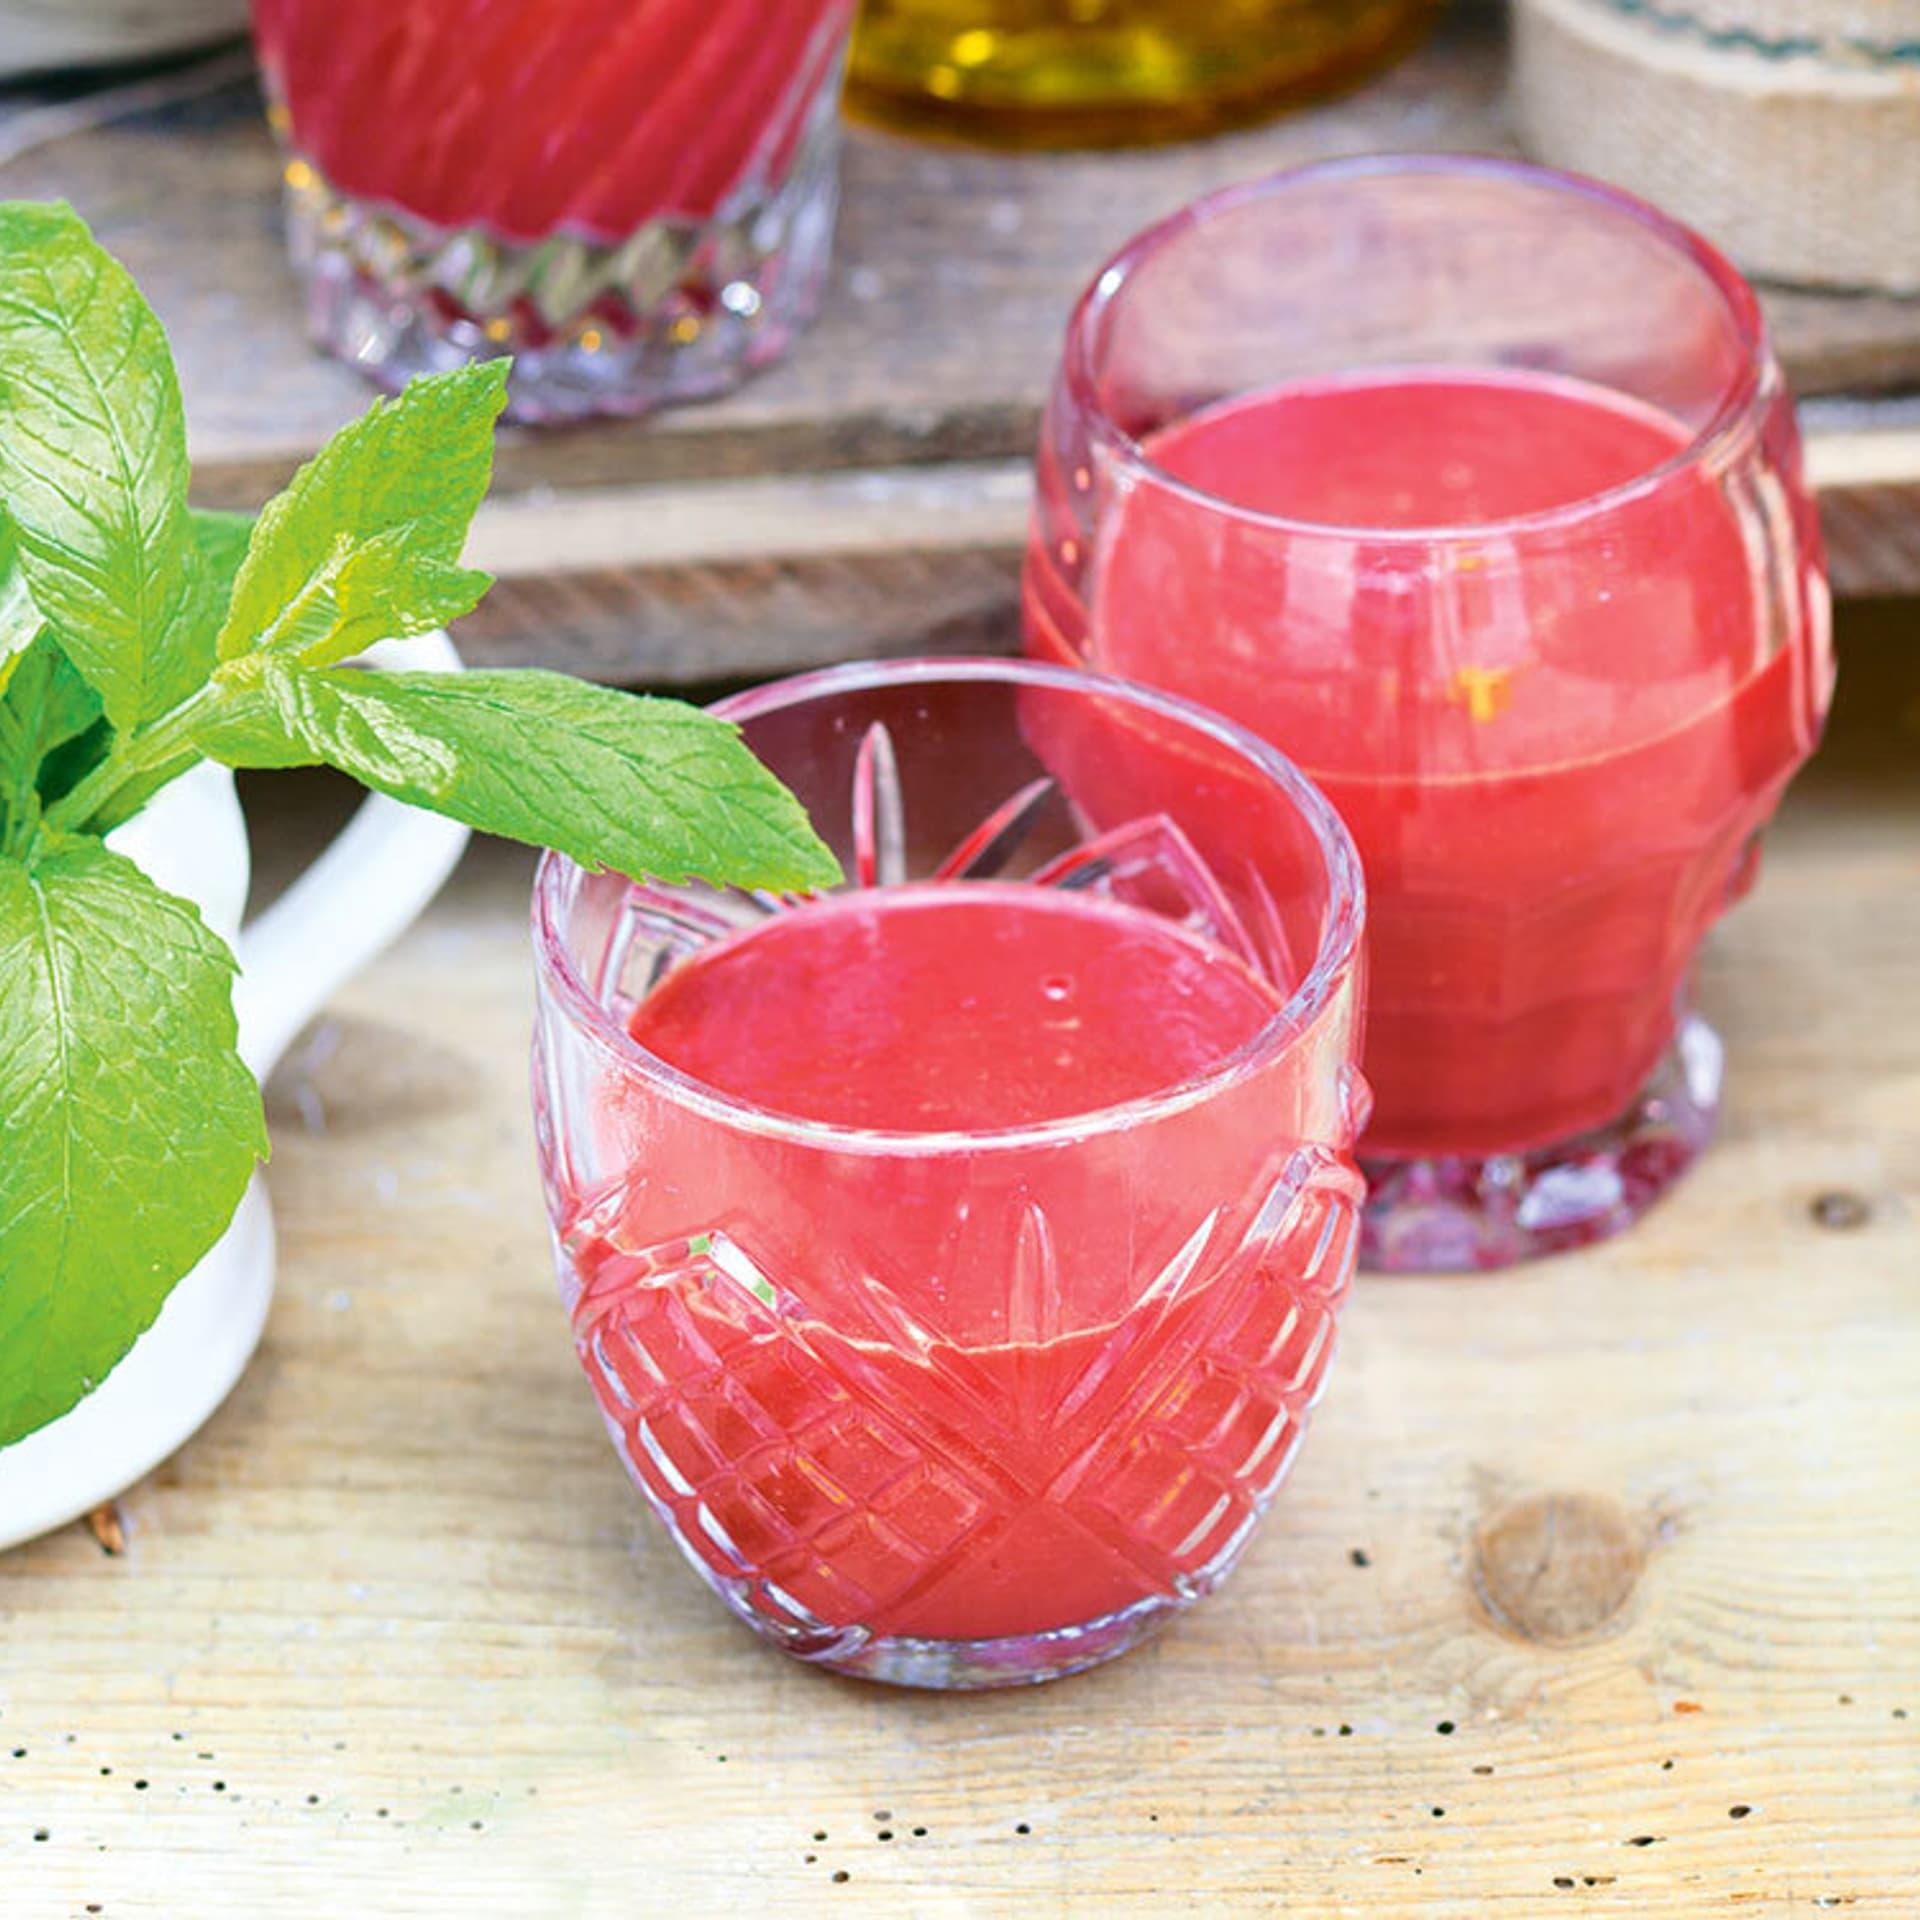 Apfel karotten rote bete smoothie